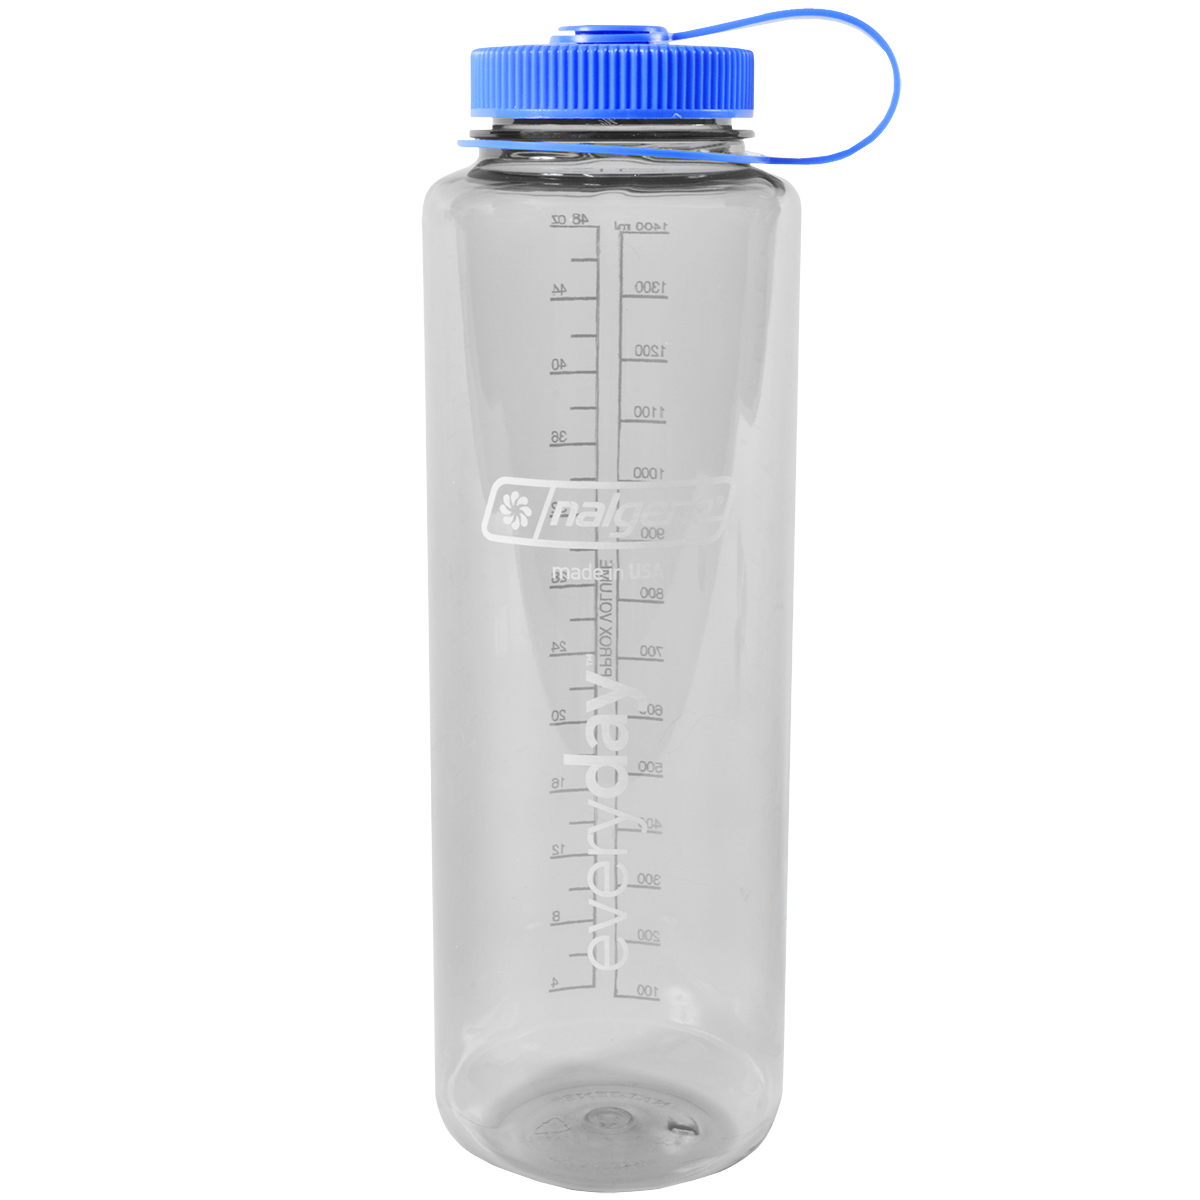 827cac59a6 Details about Nalgene Silo Tritan Wide Mouth Water Bottle - 48 oz. -  Gray/Blue